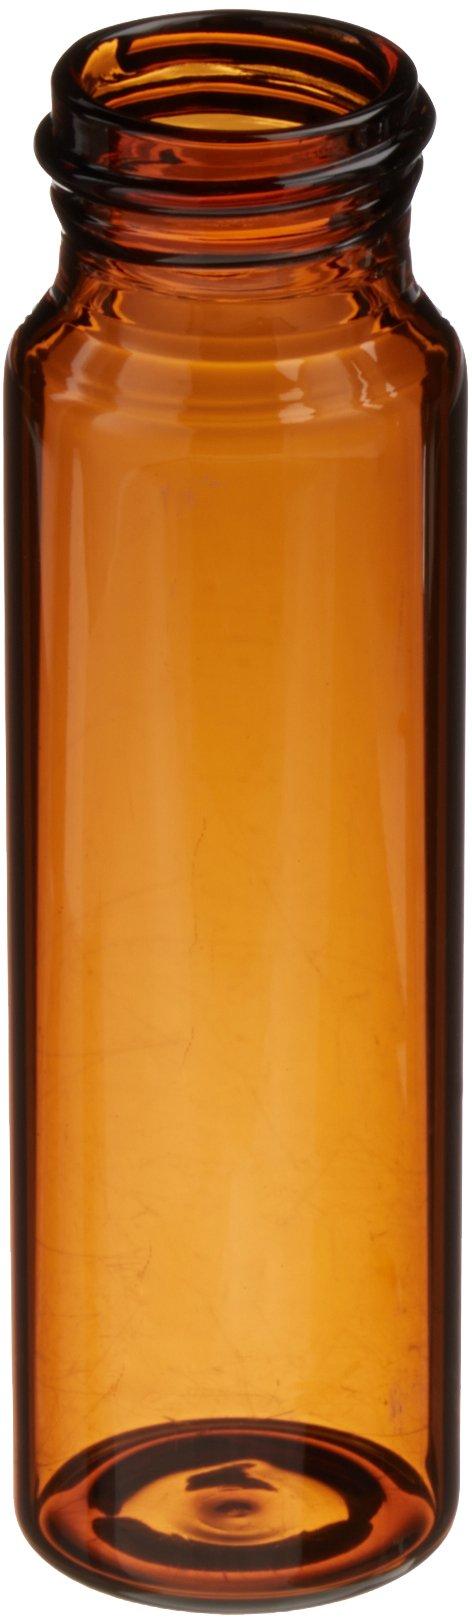 JG Finneran 340024-2895A Borosilicate Glass Environmental VOA Vial, 40mL Capacity, Amber, 28mm Diameter x 95mm Length, 24-400mm Thread (Pack of 144)